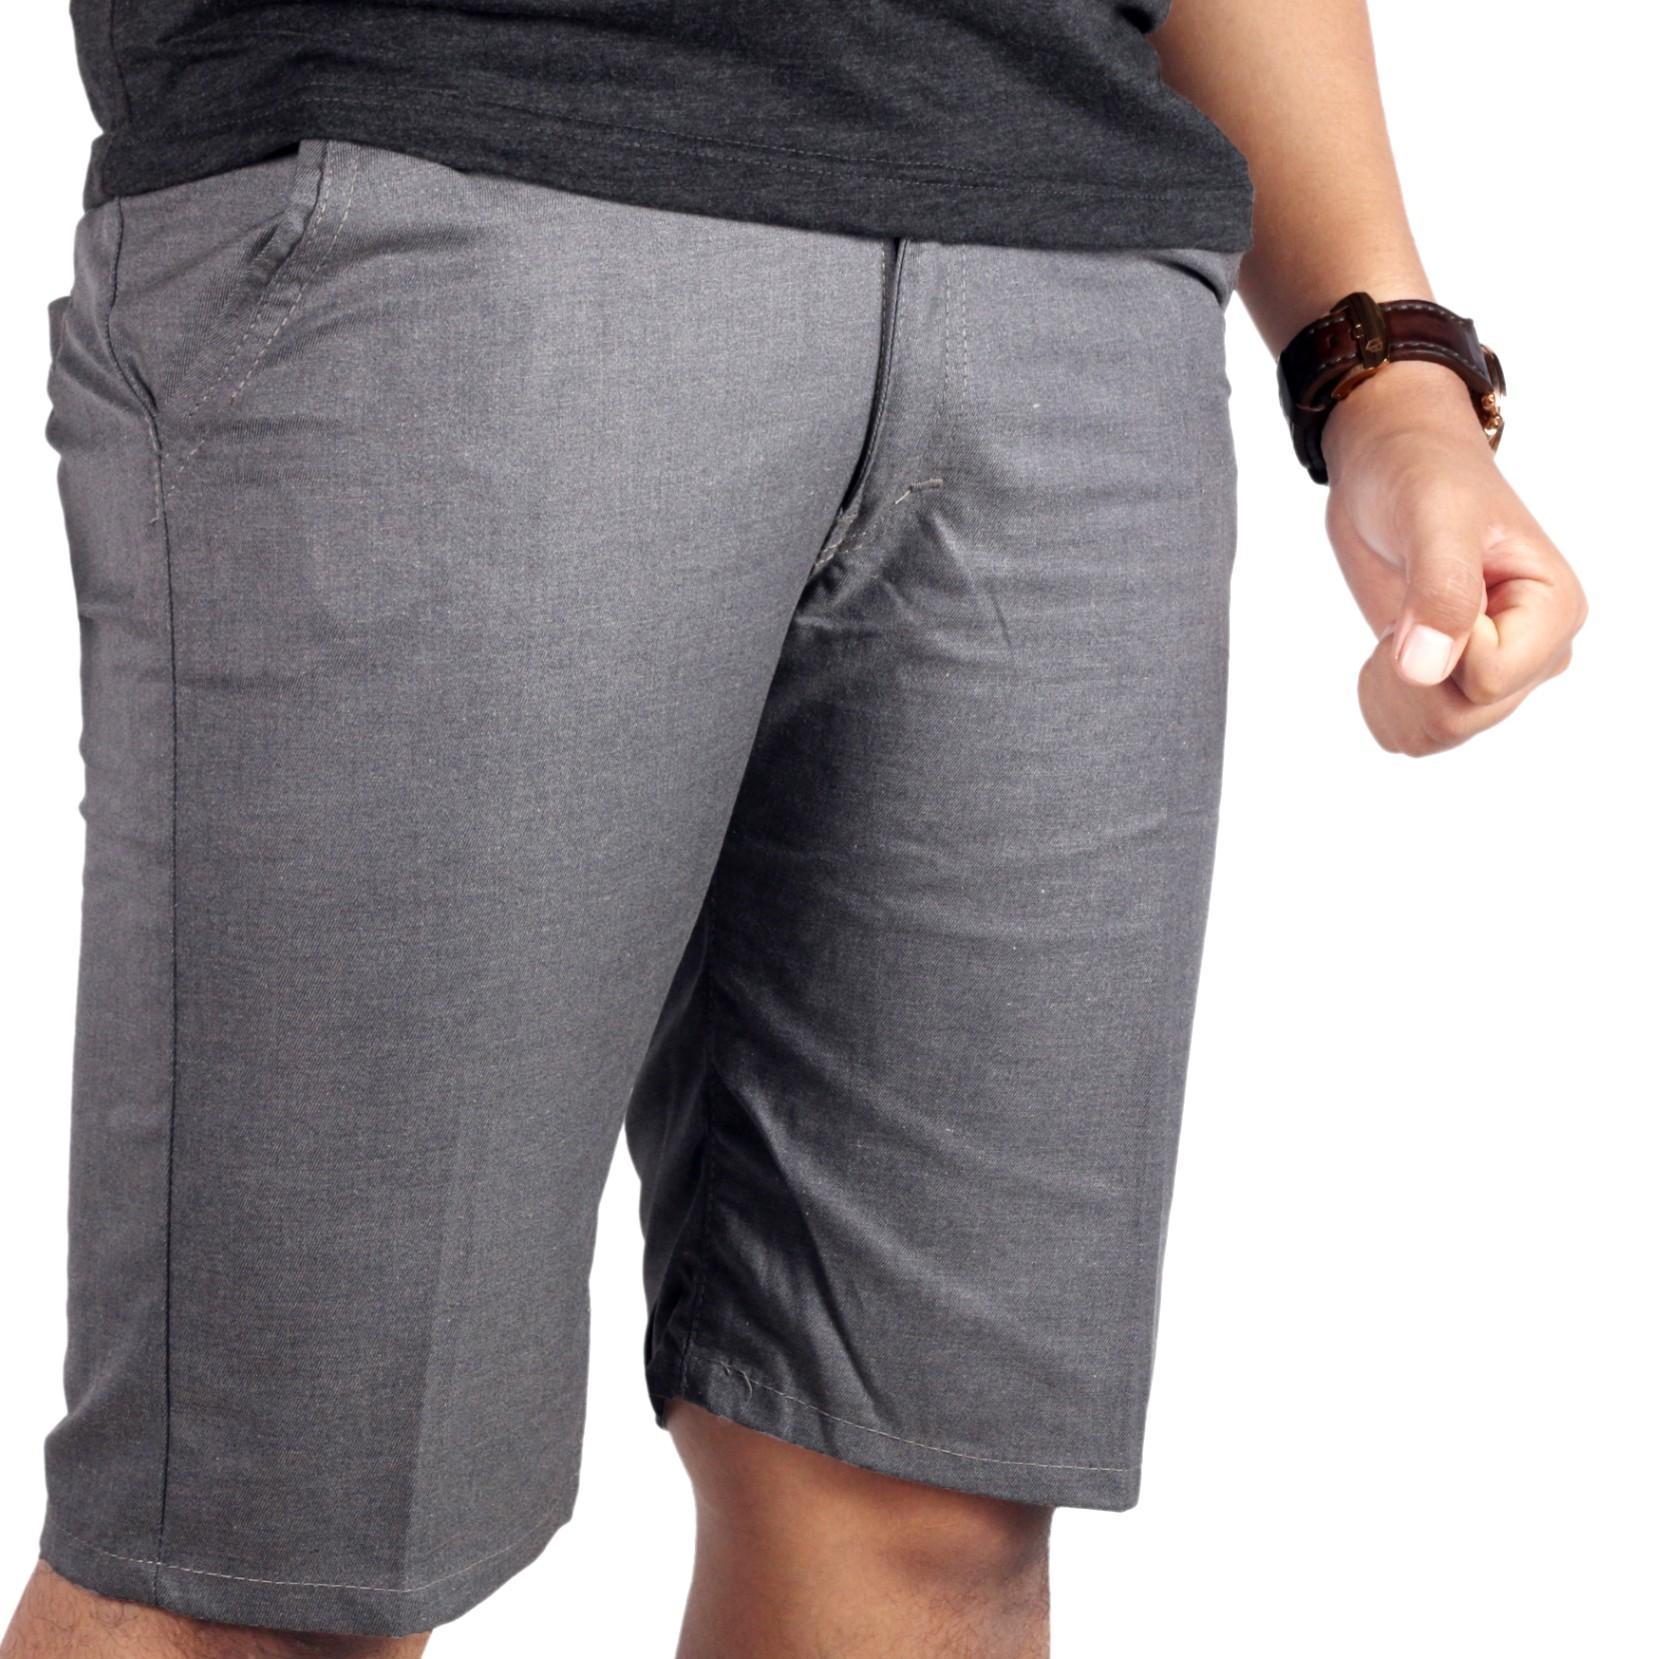 Cek Harga Baru Dgm Fashion1 Celana Chino Panjang Abu Polos Htam Pendek Distro Skinny Pants